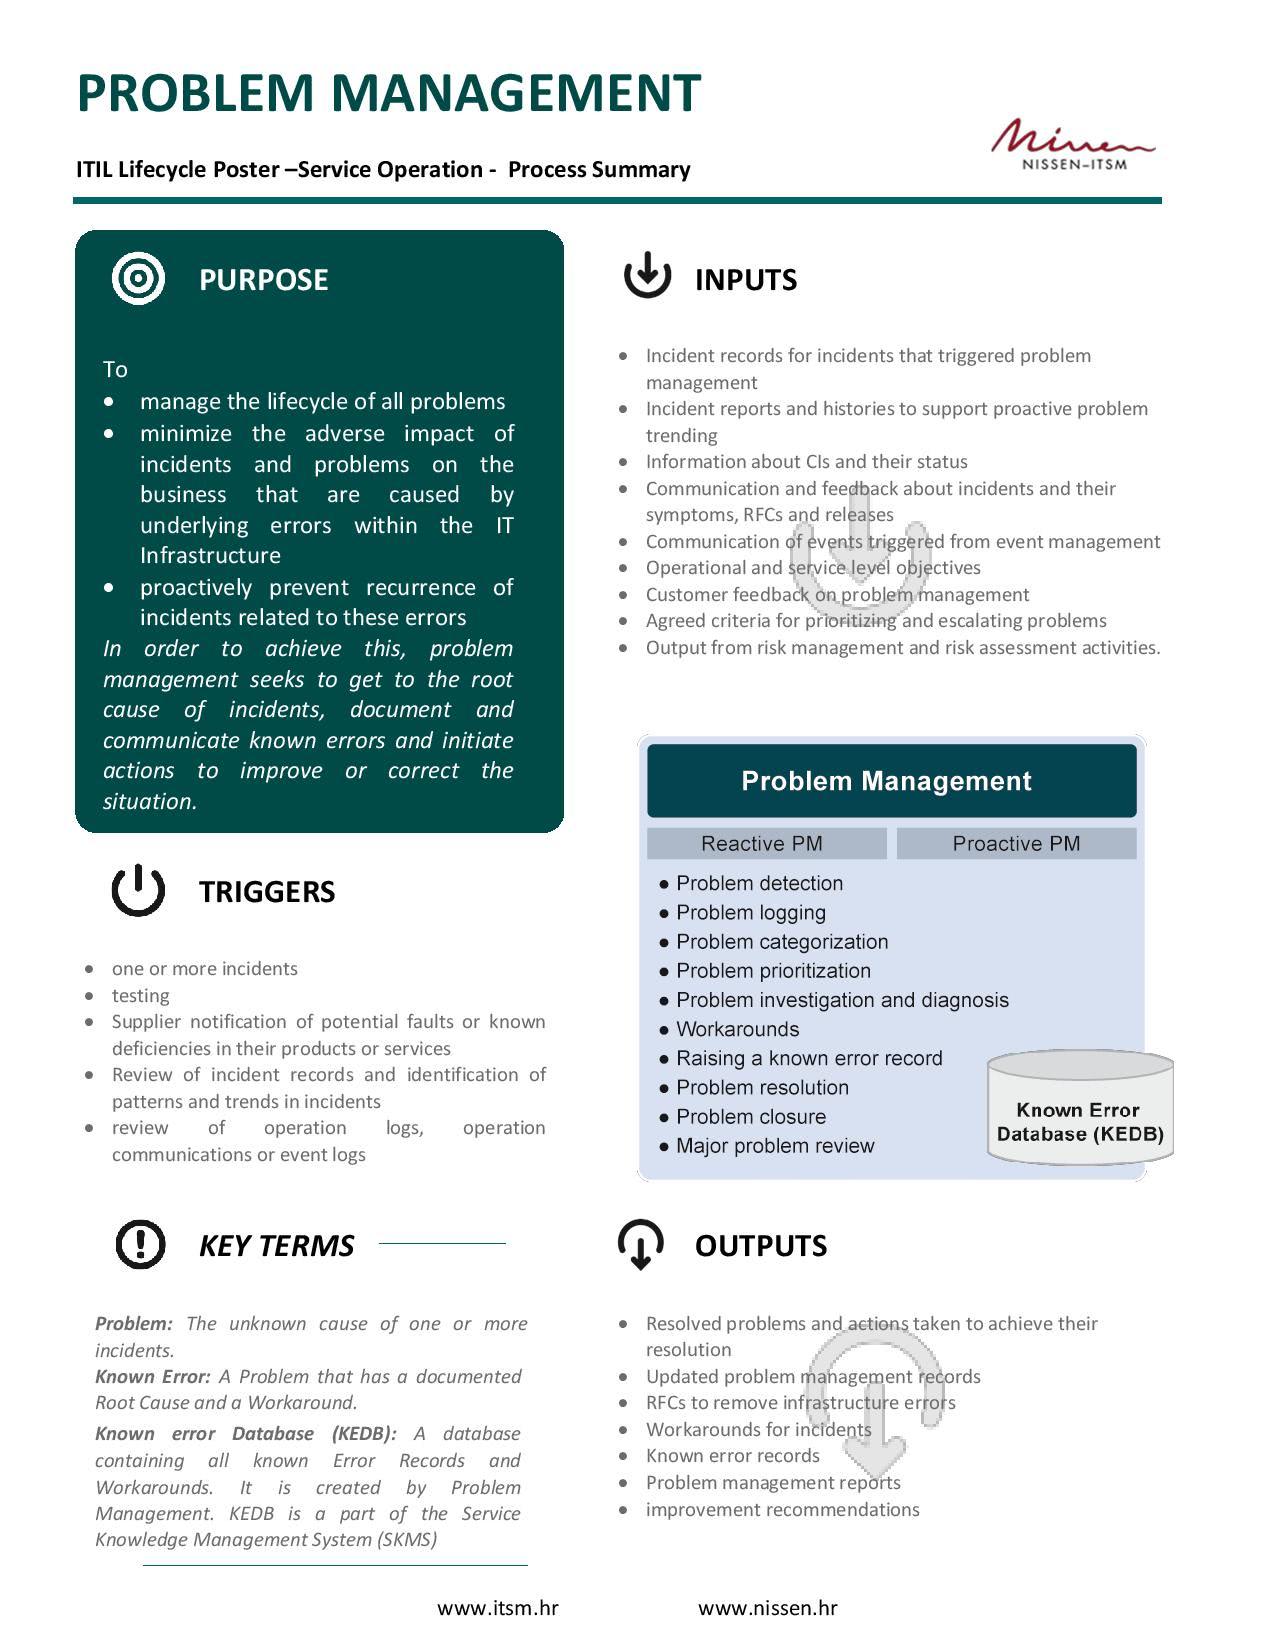 Problem Management: Nissen ITSM & ITS Partner